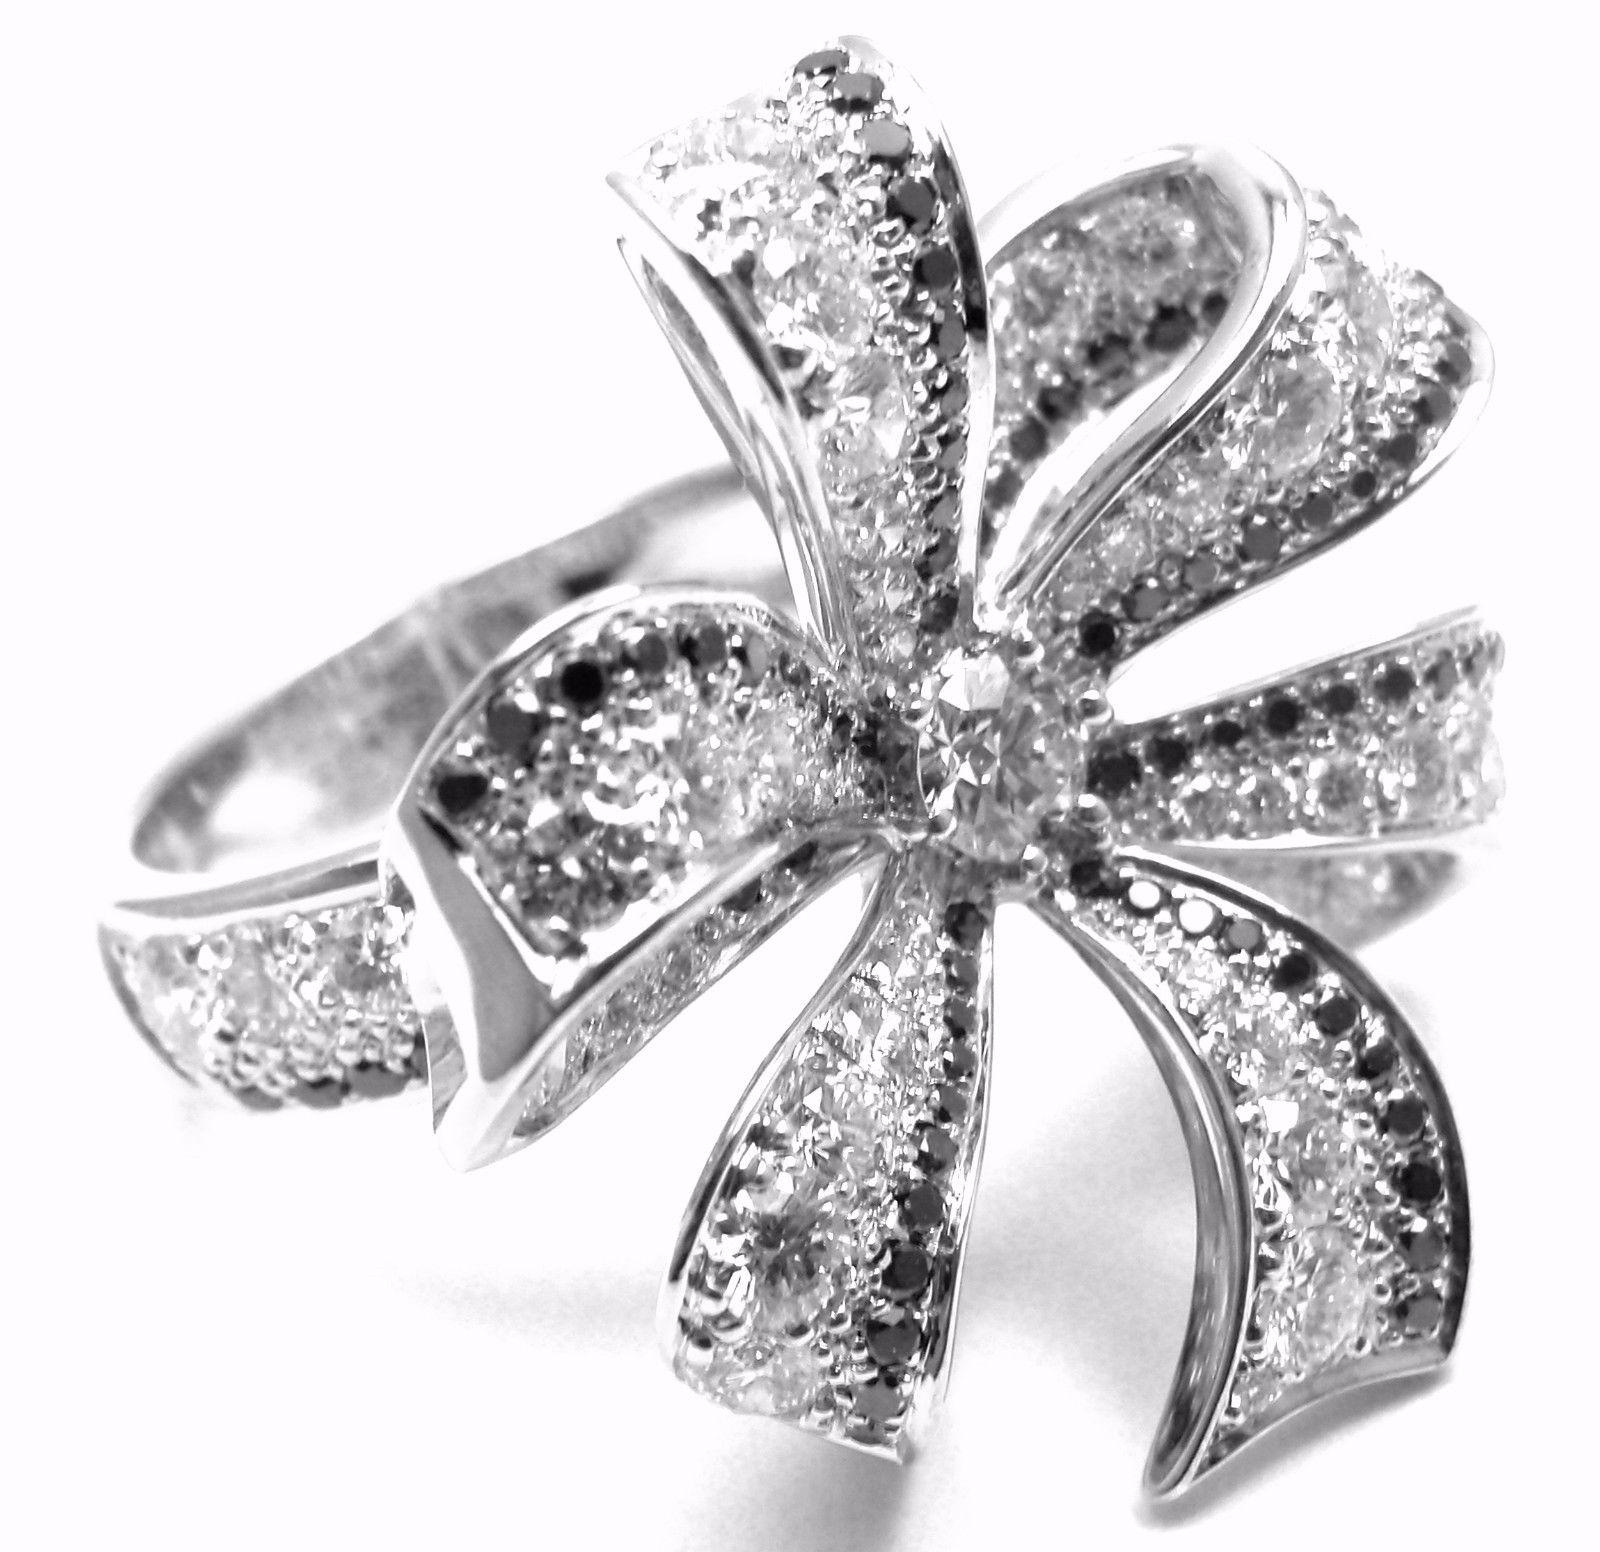 Chanel 1932 18k White Gold White & Black Diamond Ring